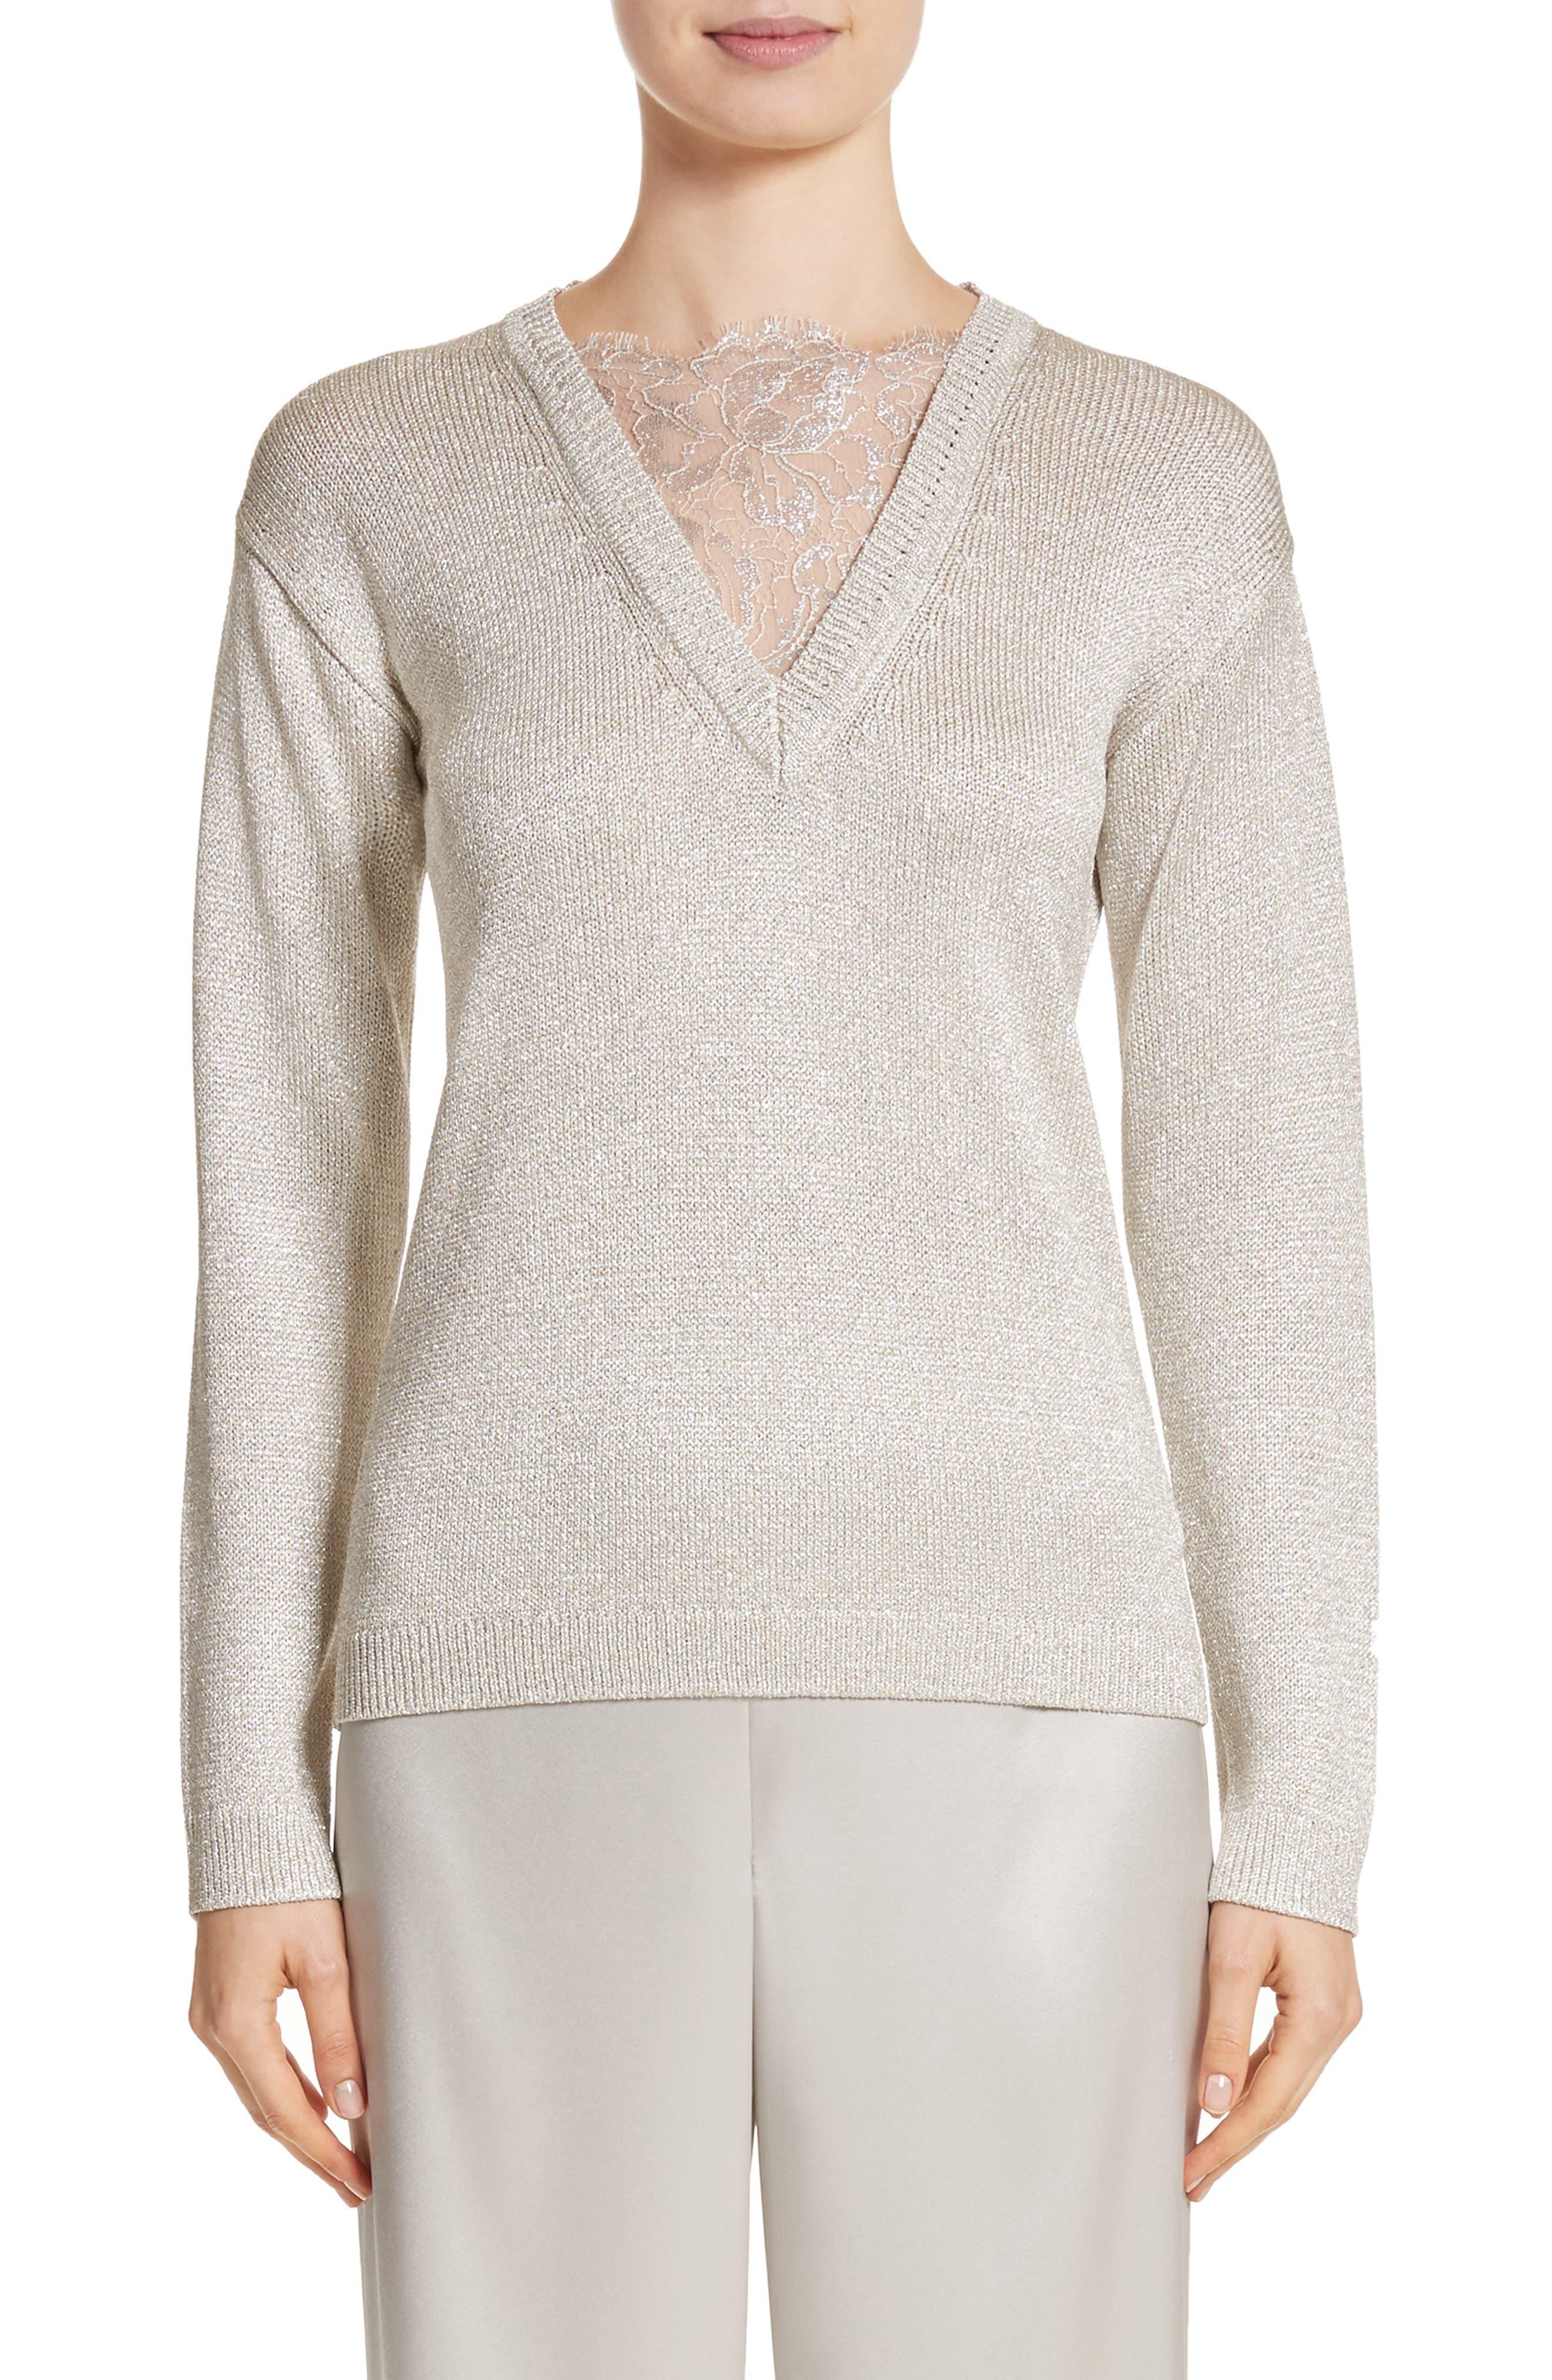 Main Image - St John Collection Metallic Jersey Knit Sweater